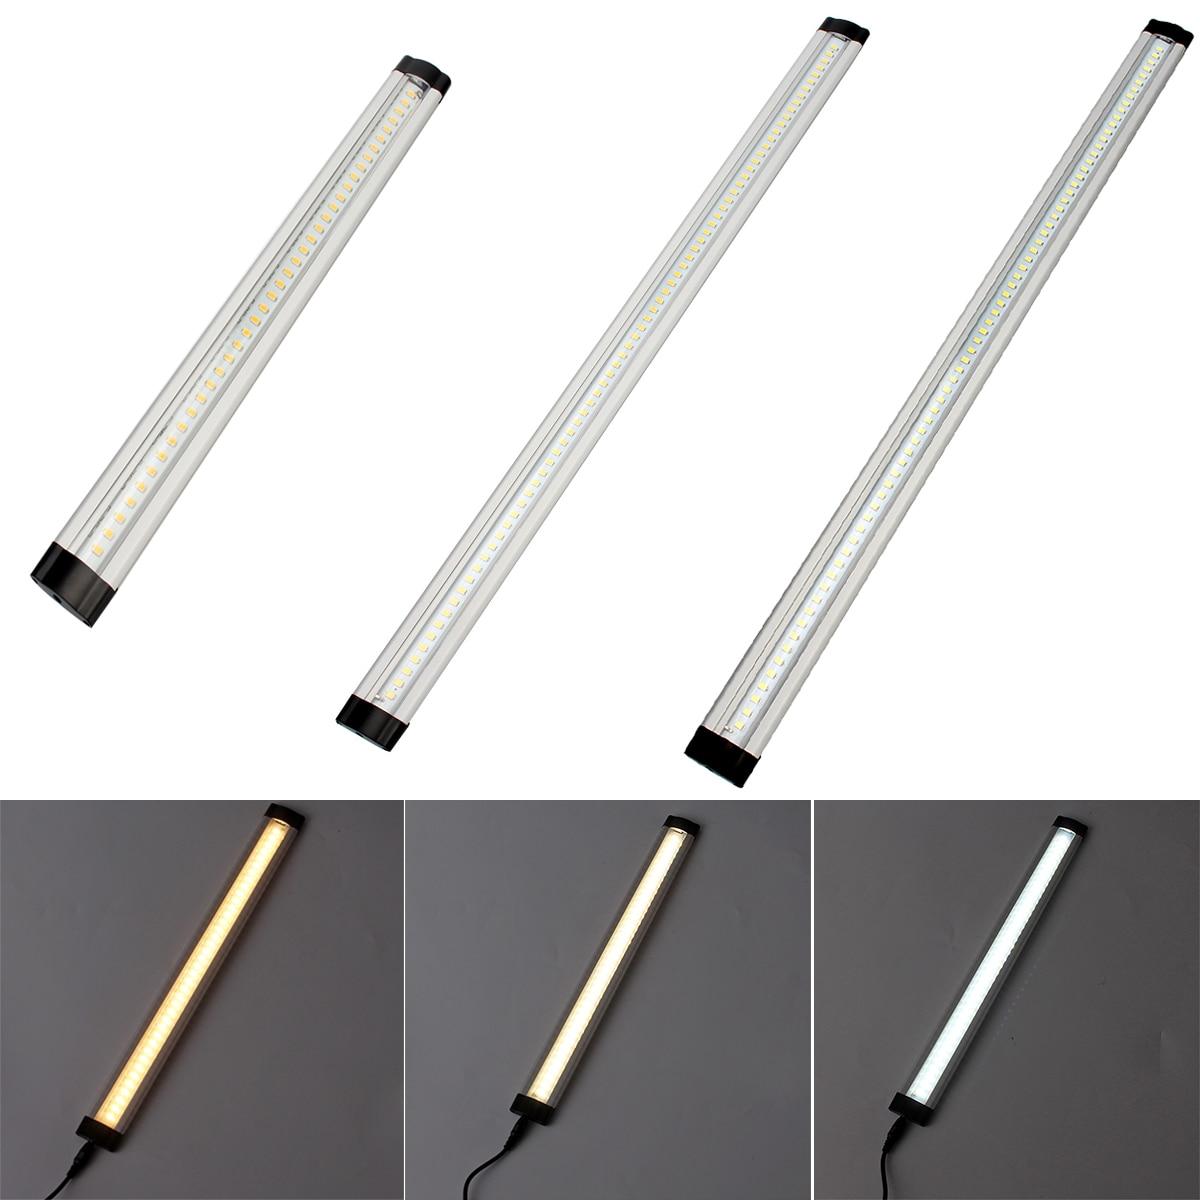 24v Dc 3w 5w 30cm 50cm Aluminum Kitchen Light Slim Lamps